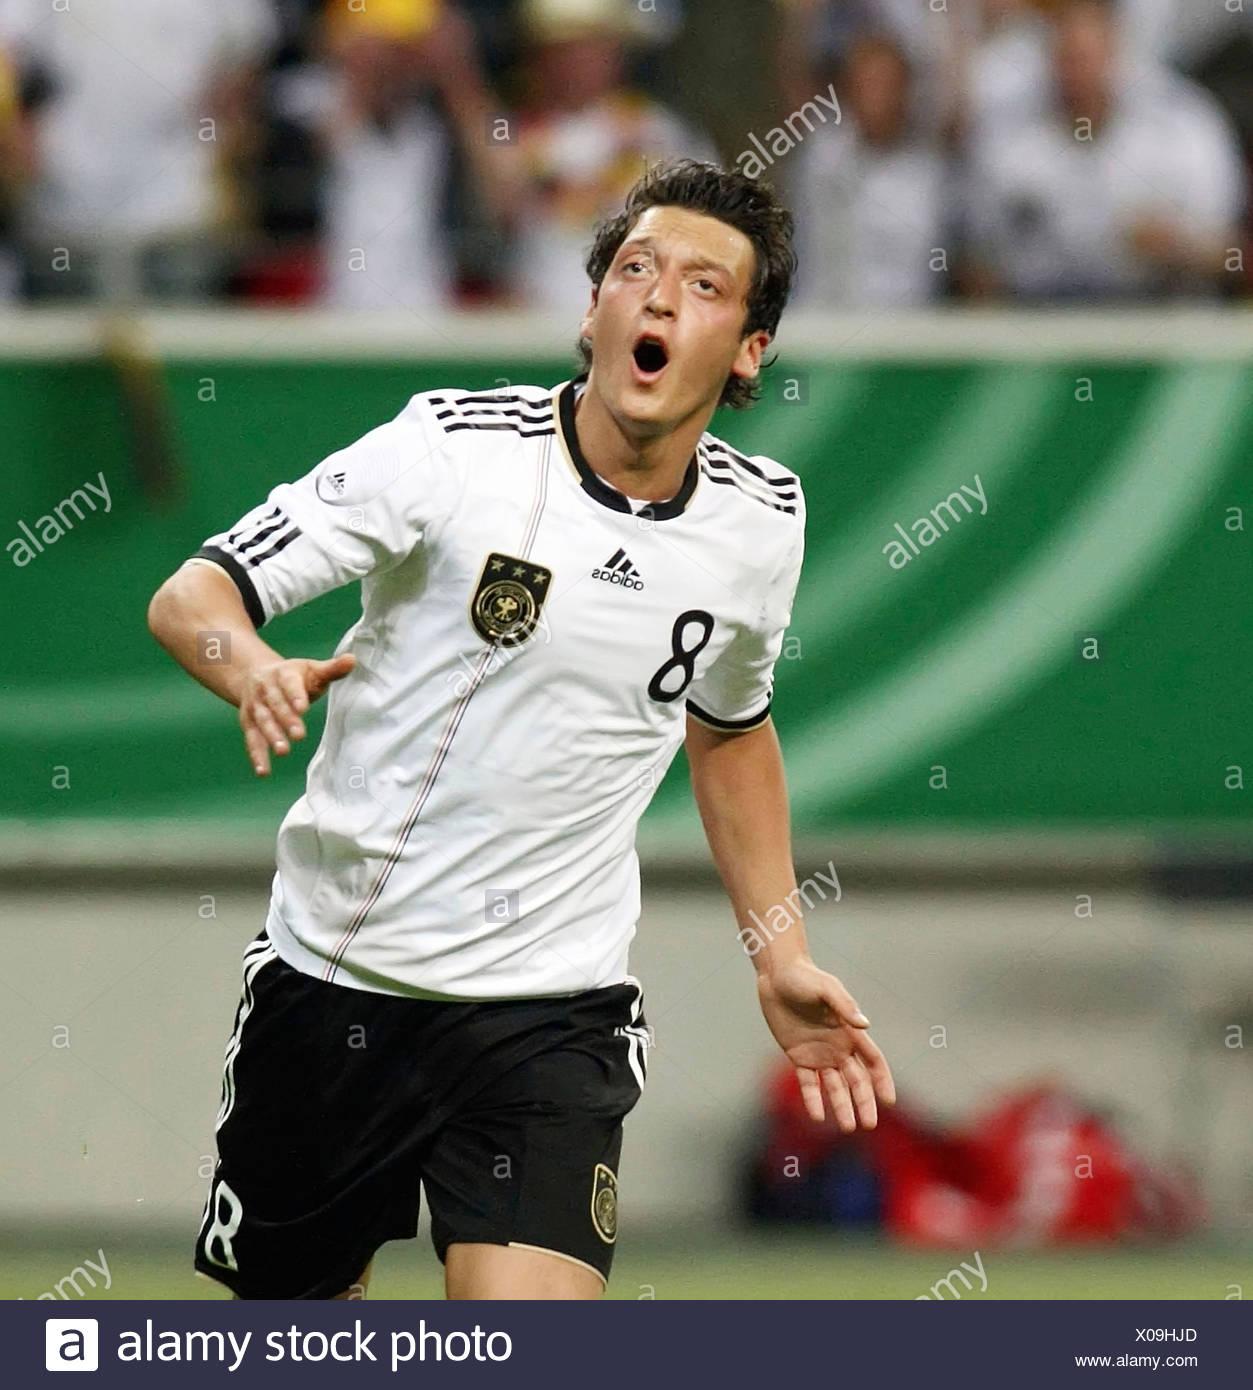 Deutscher Fussballspieler Mesut Oezil Stockfoto Bild 275577301 Alamy